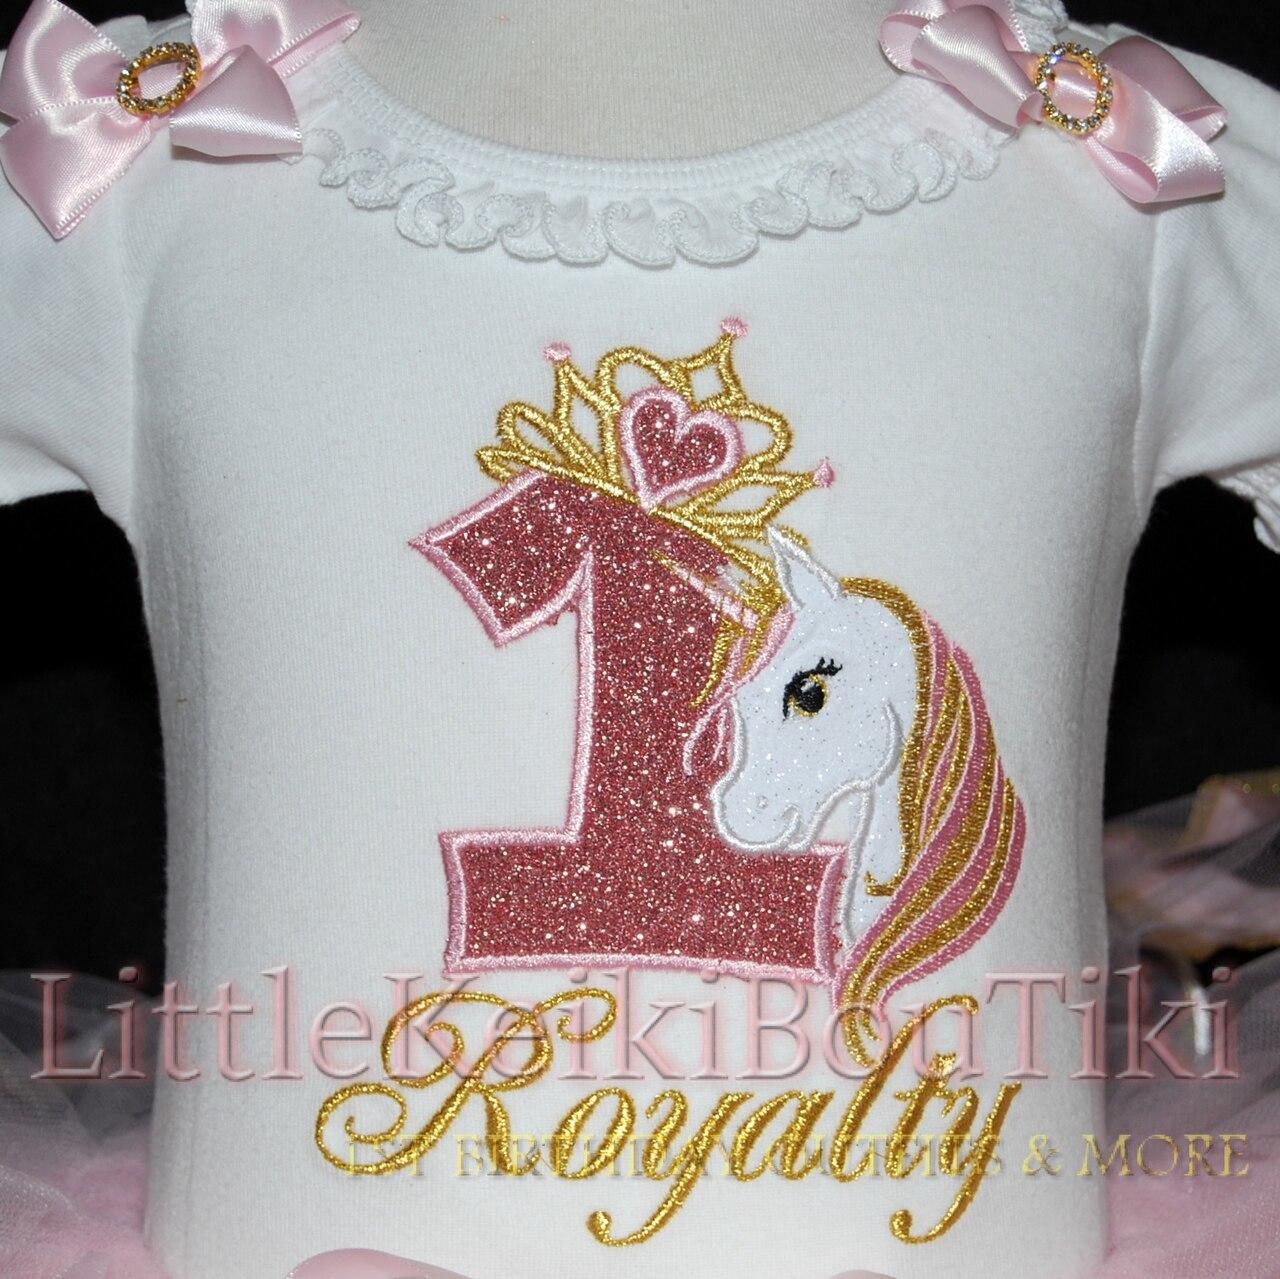 1st birthday girl outfit unicorn birthday tutu outfit with Royal Unicorn